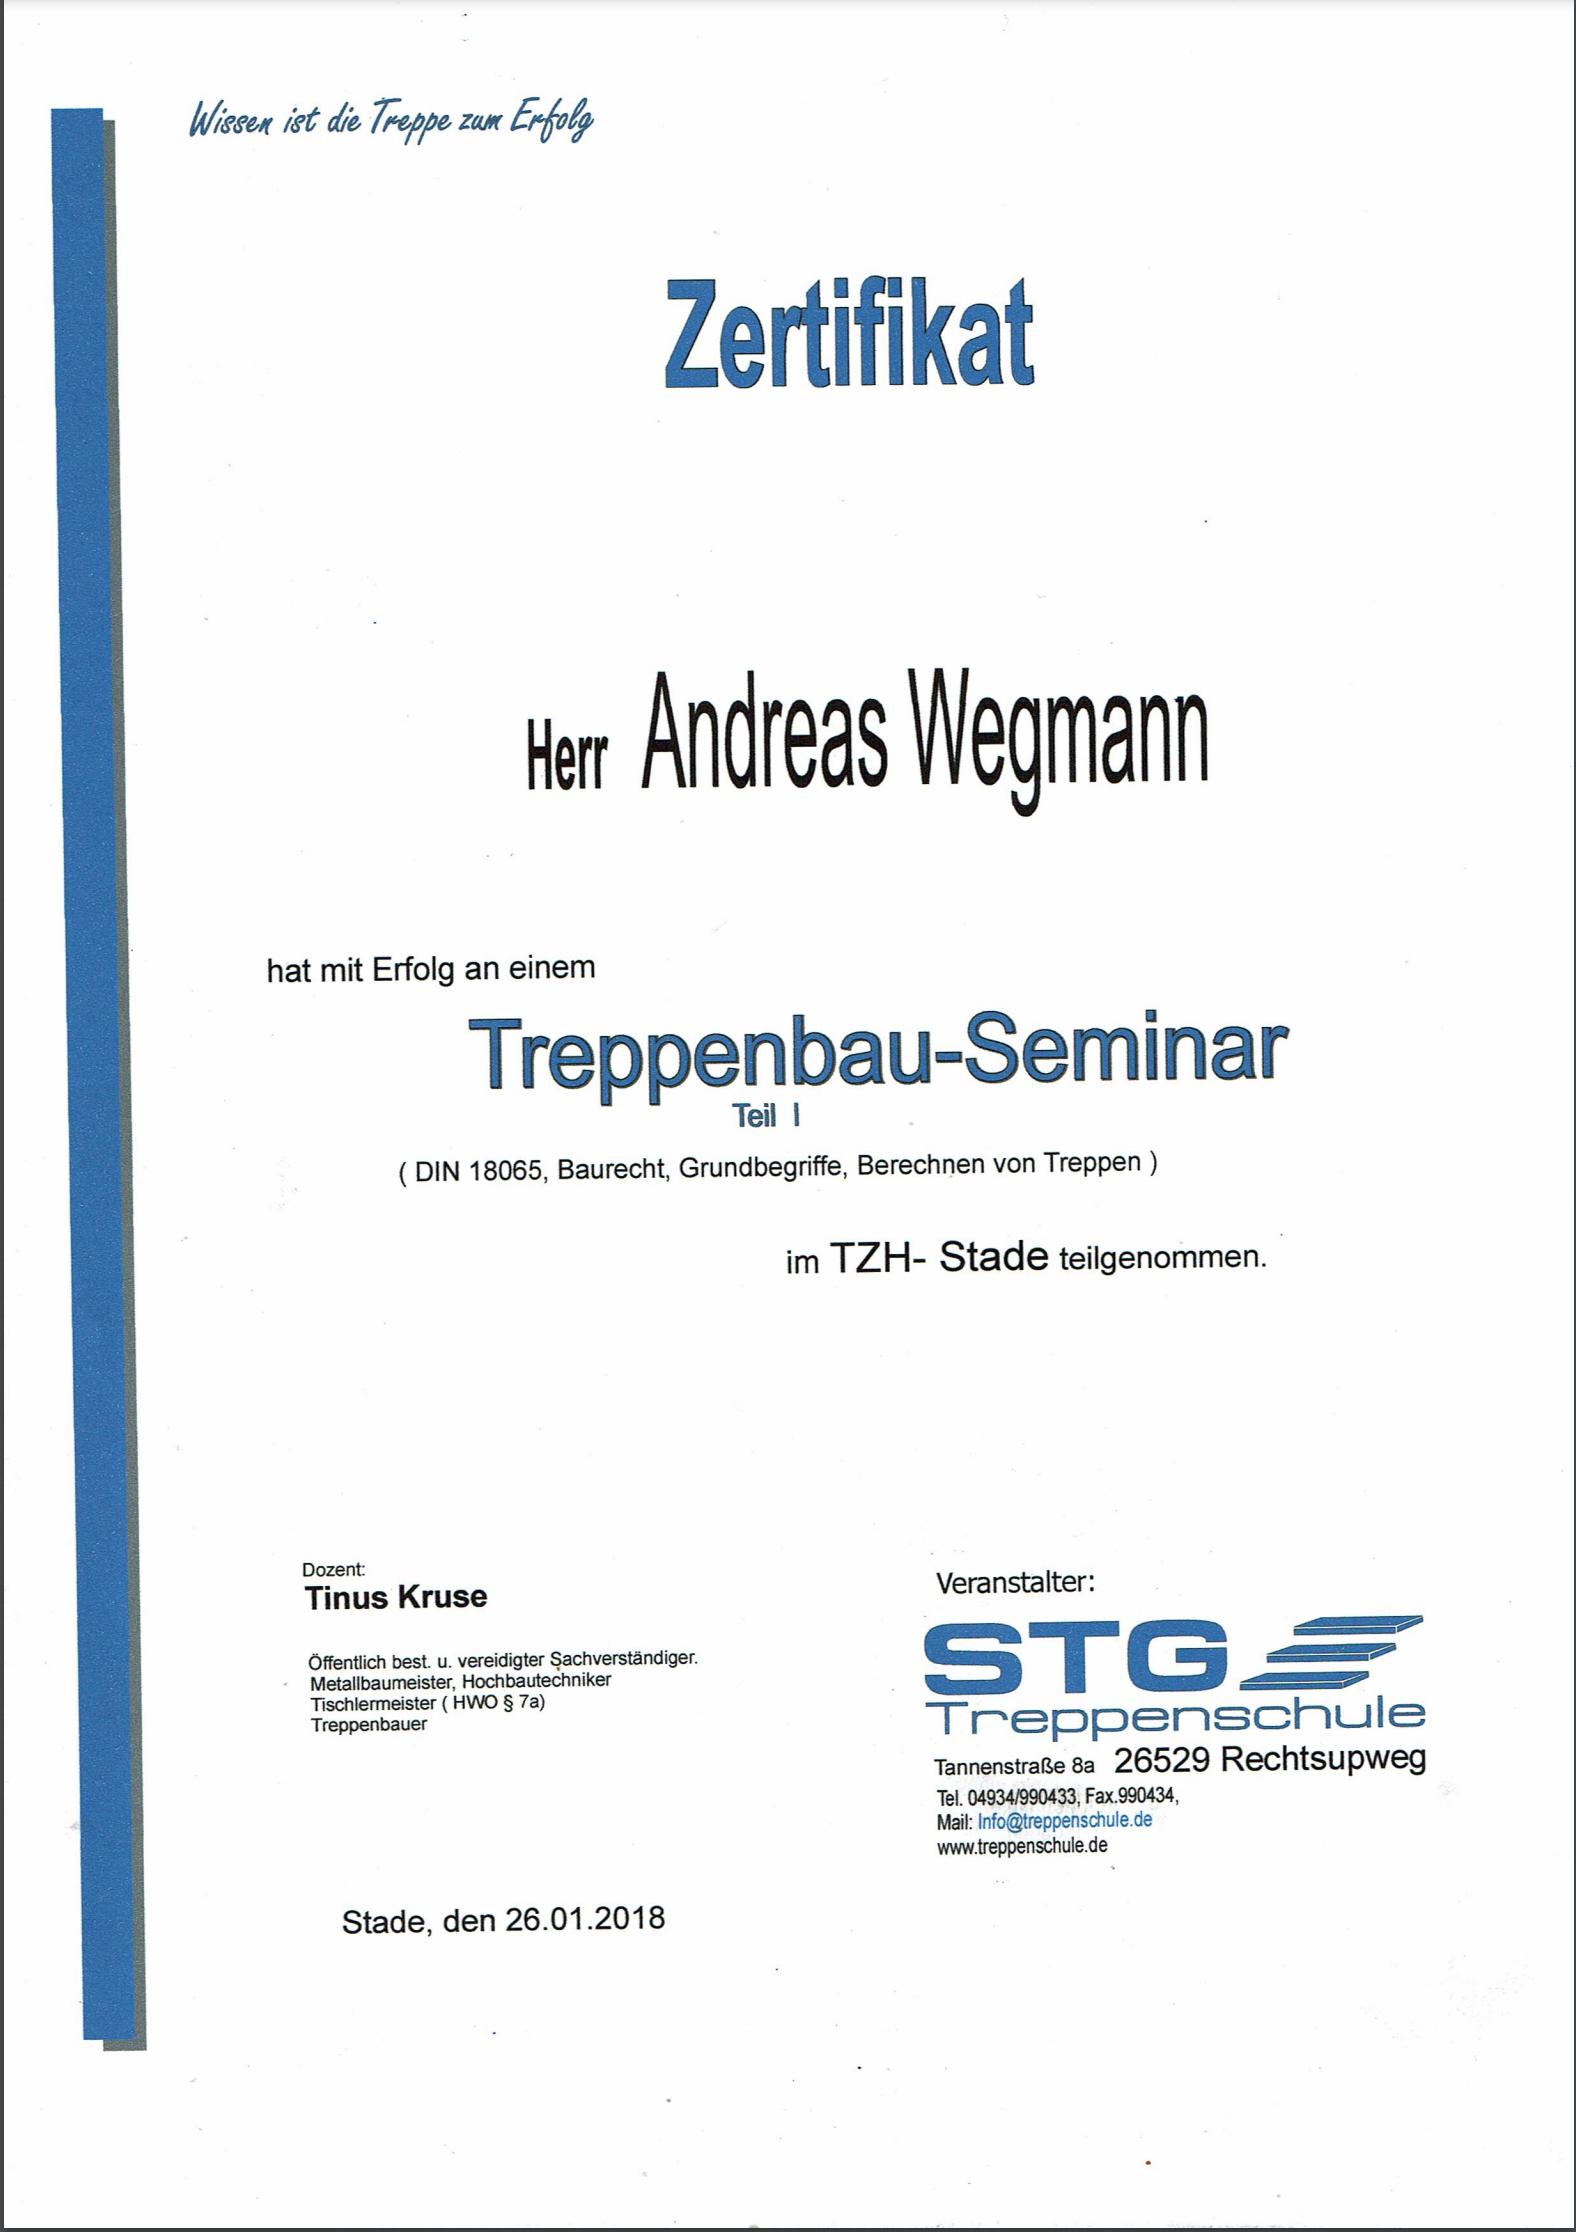 Zertifikat Treppenbau-Seminar - Schmiede und Schlosserei Wegmann aus Heiligenhaus